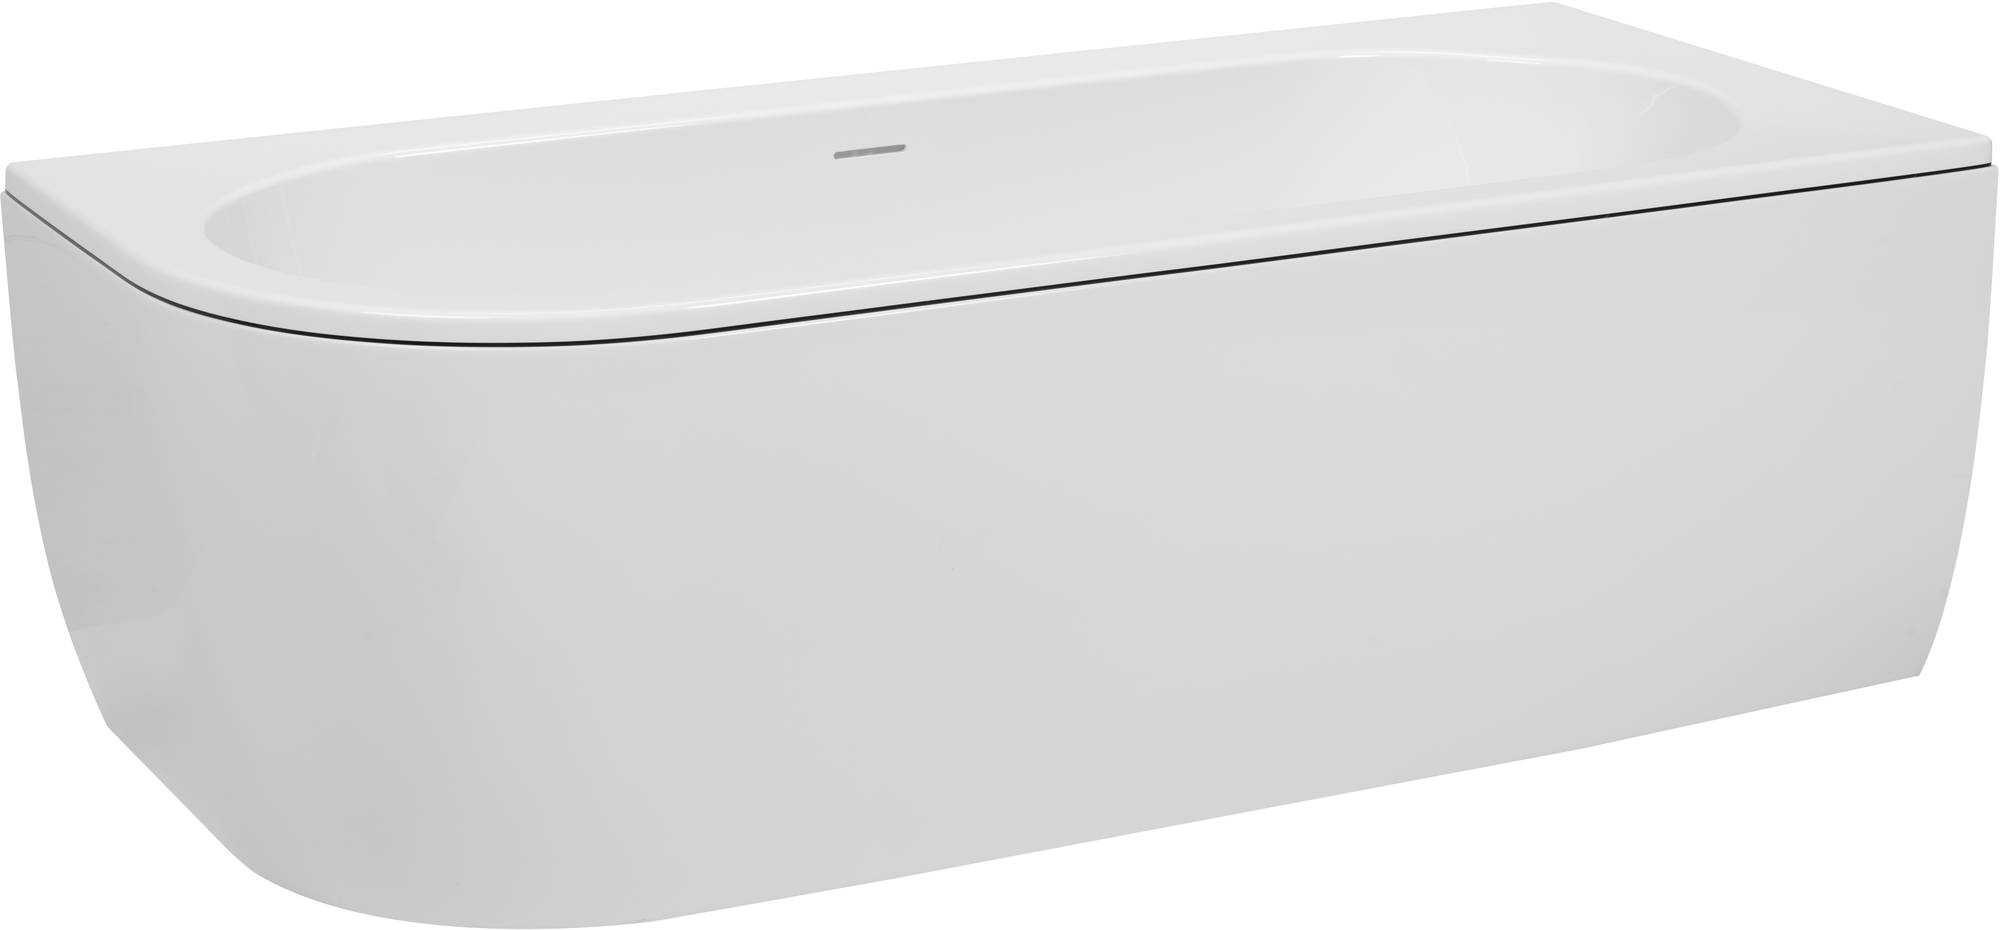 Saniselect Hilla Bad Back-to-Wall R met zwarte rand en witte waste cover 180x80x60 cm Wit